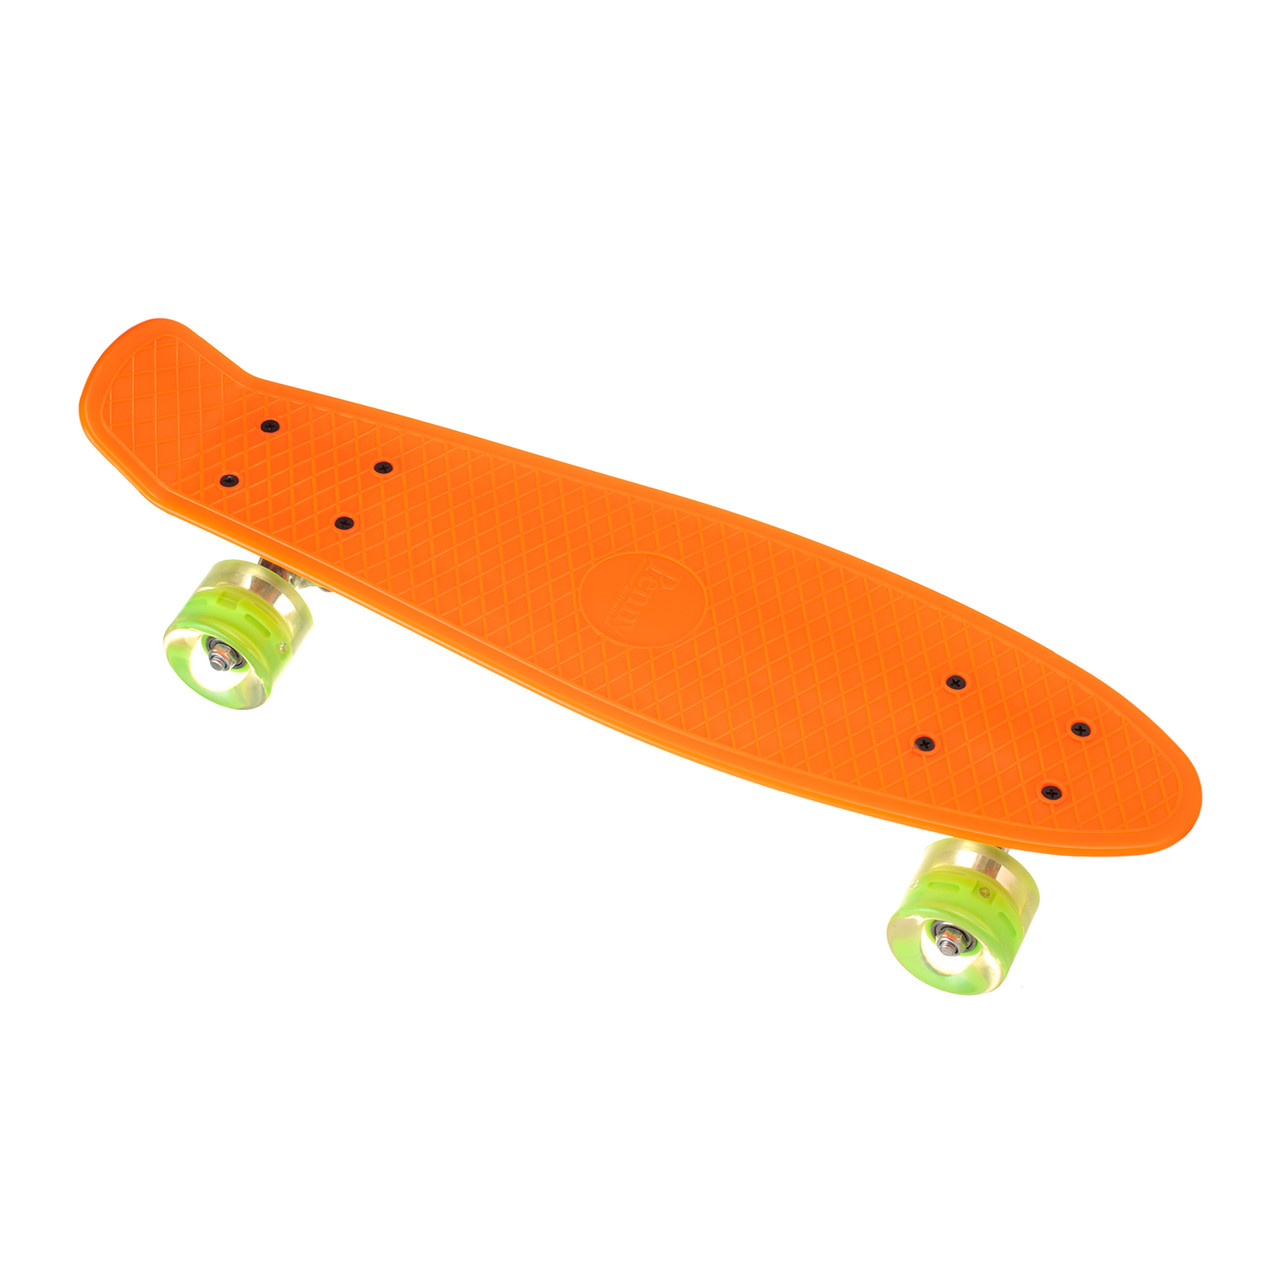 Пенниборд-скейт 23, колёса PU СВЕТЯЩИЕСЯ